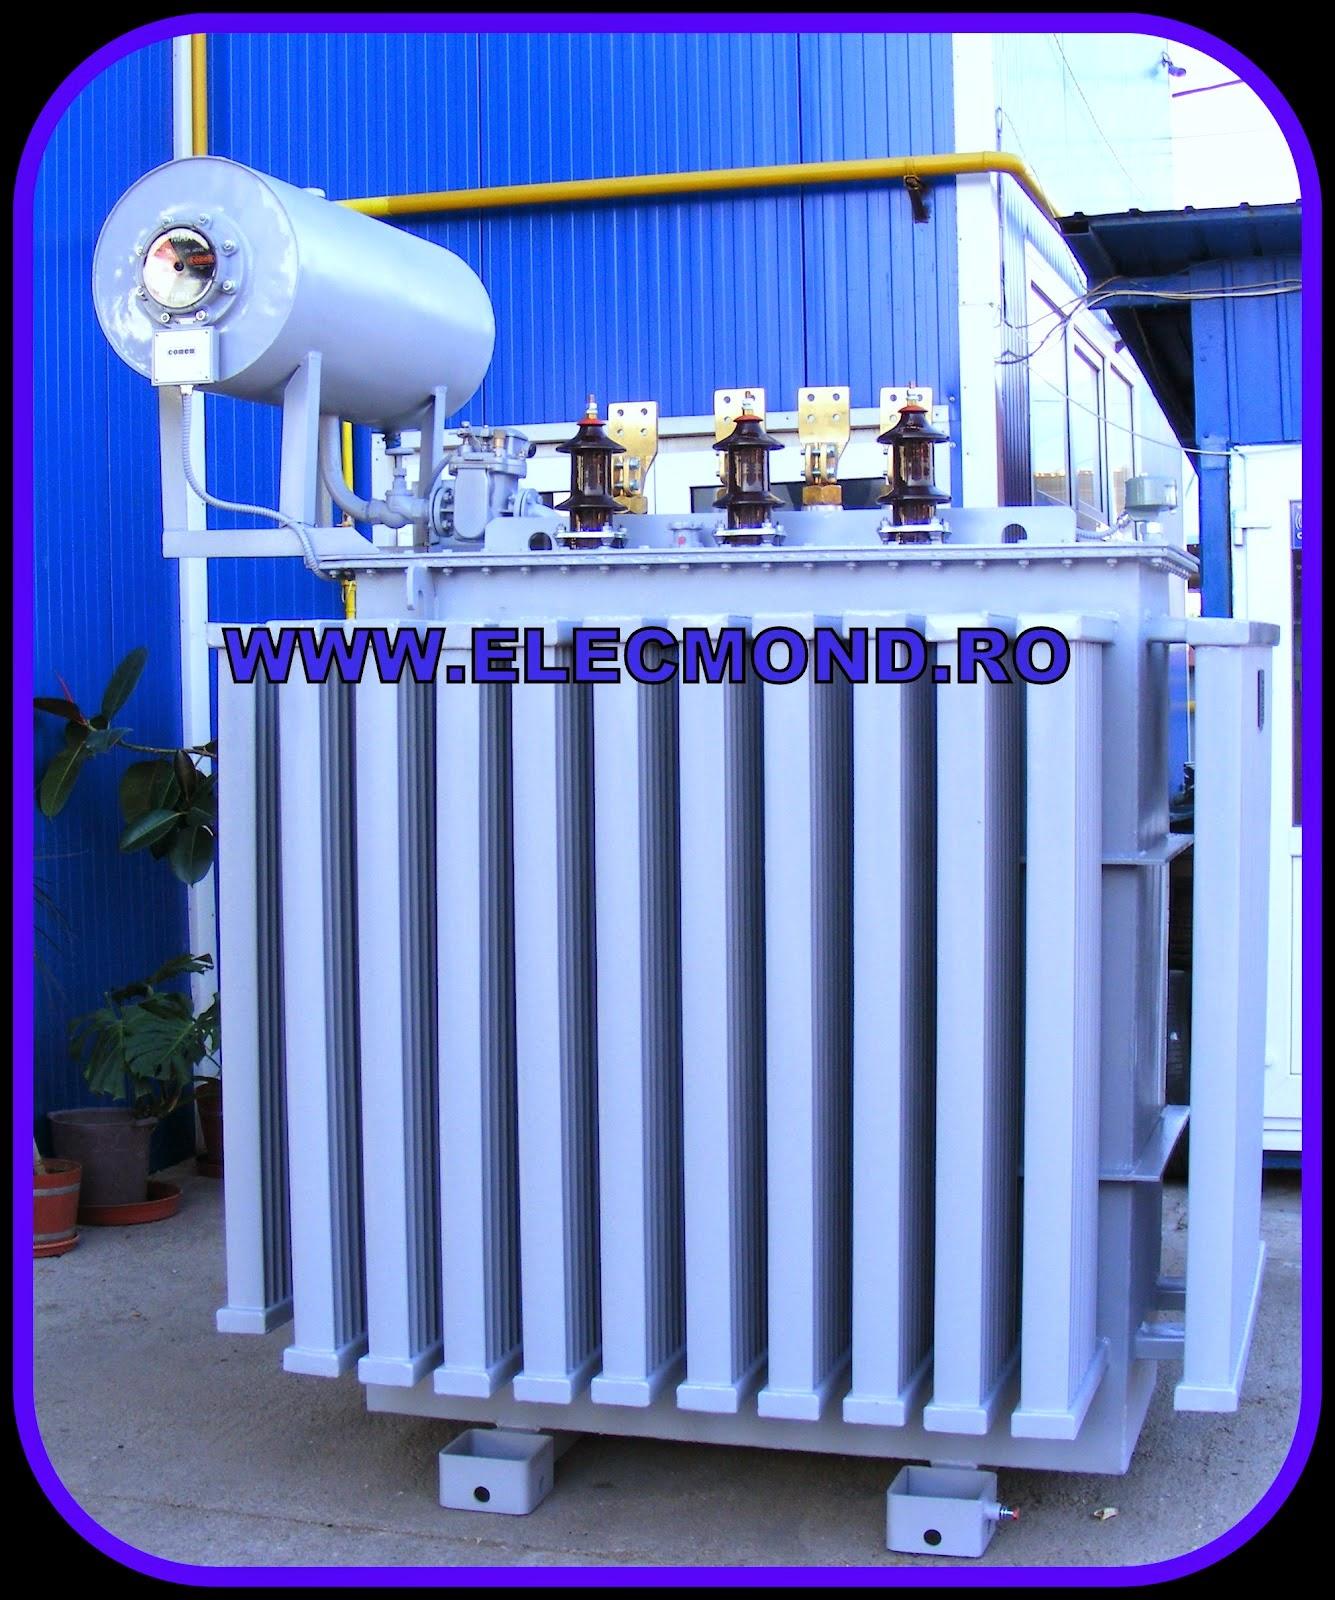 transformator , transformatoare , transformatoare din stoc , elecmond , elecmond blog , transformatoare electrice , transformatoare de putere , reparatii transformatoare , transformator 1600 kVA